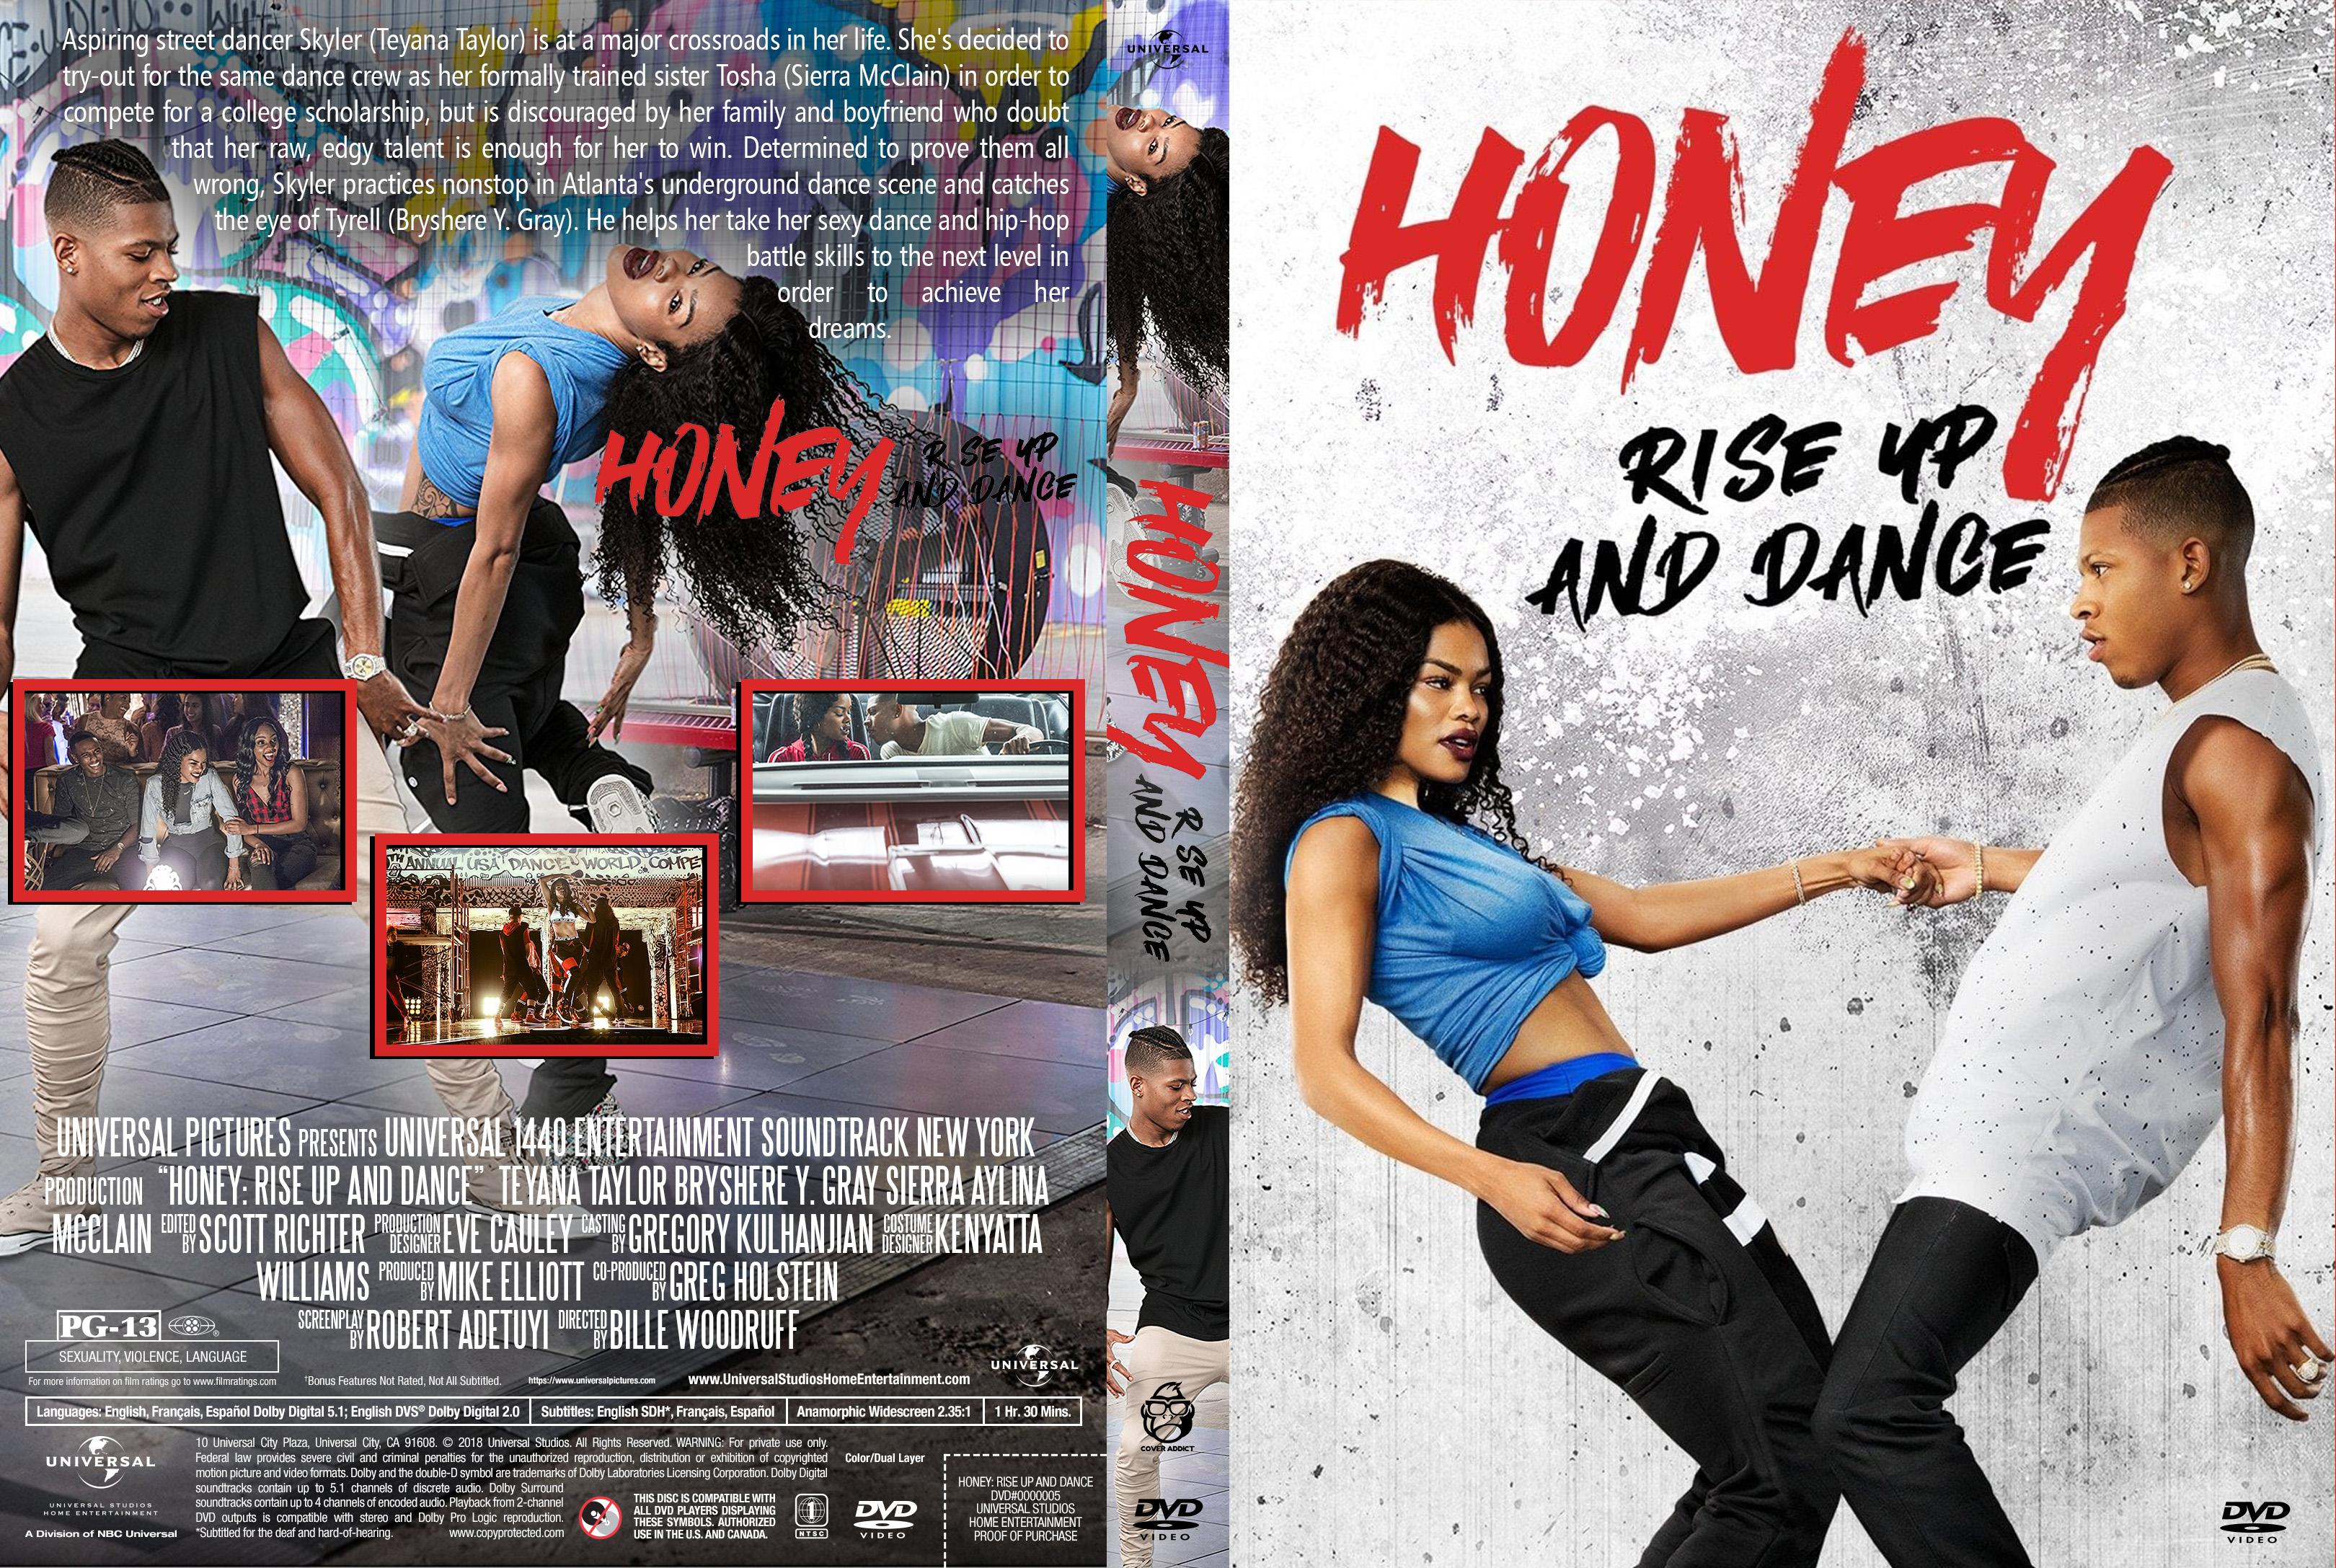 Dance dvd pic 81